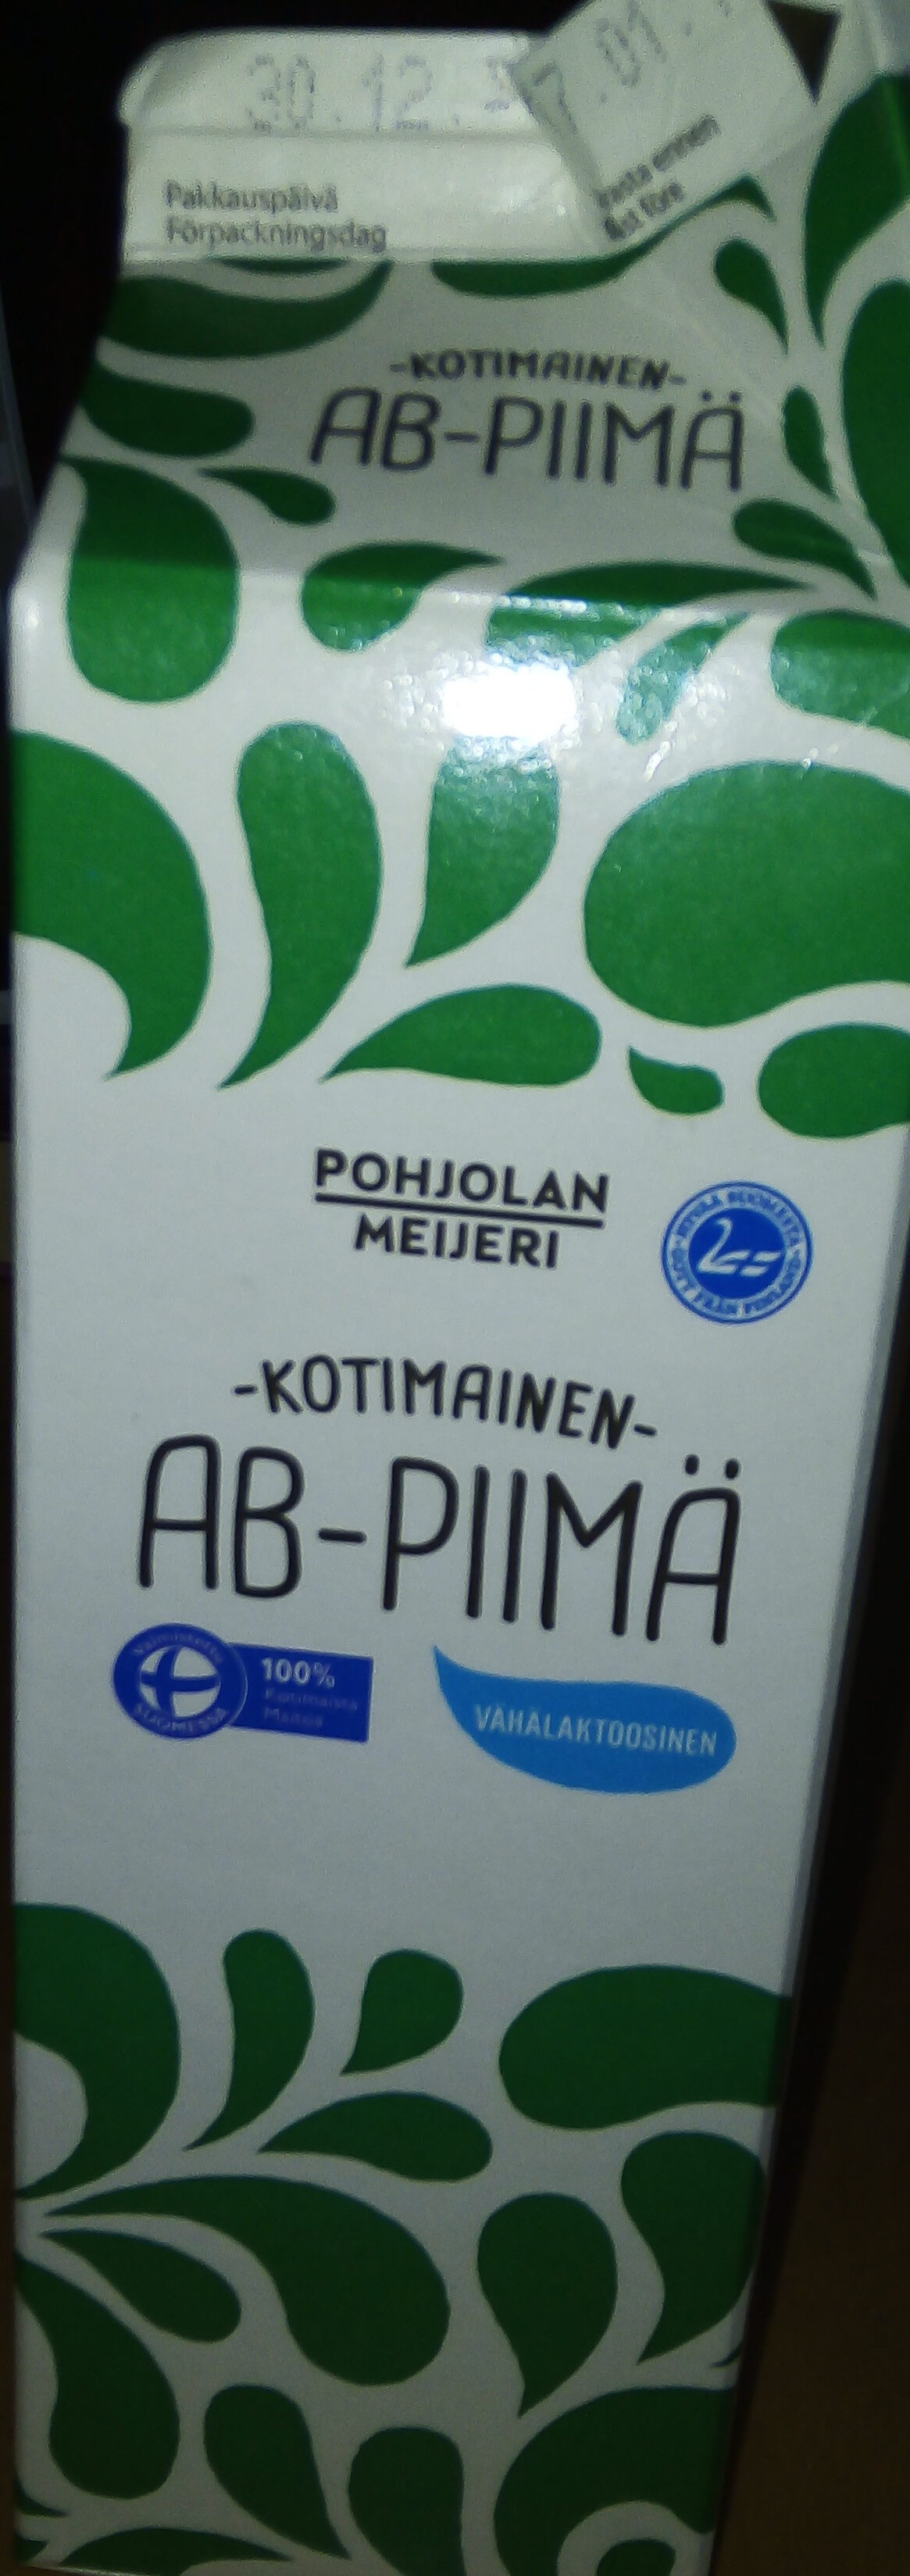 Ab-piimä - Tuote - fi